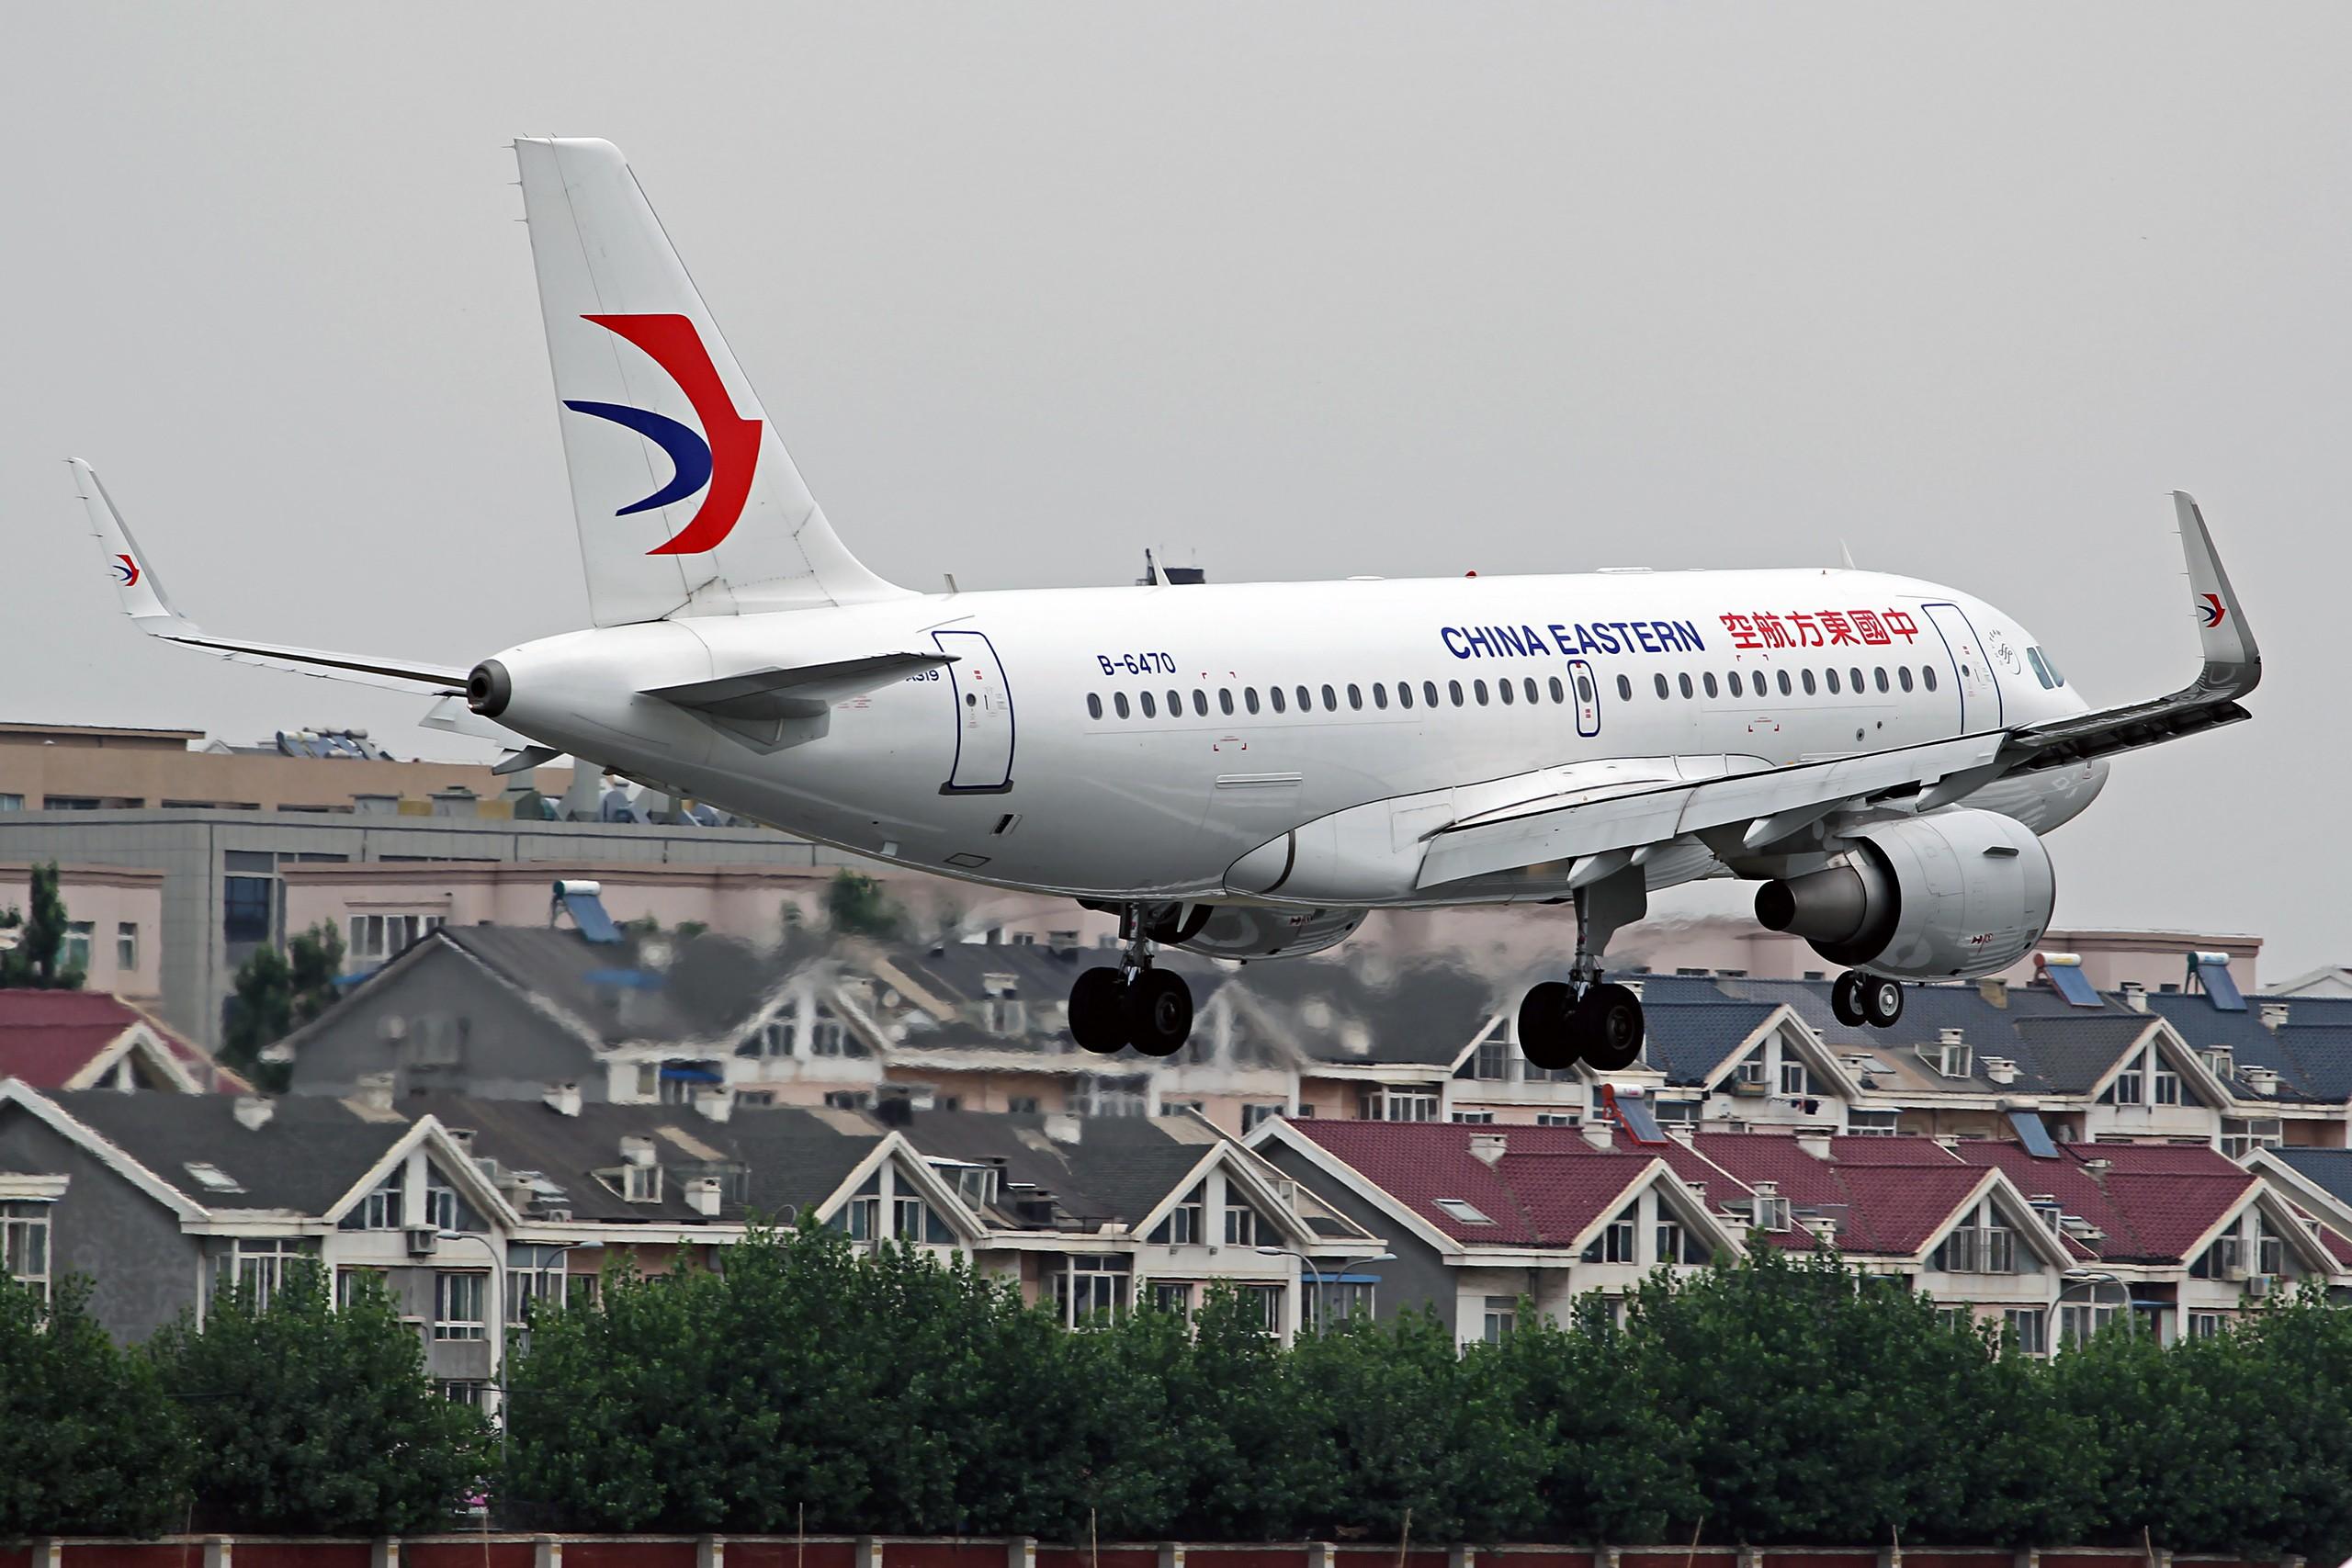 Re:[原创][DLC]...窄体机...2560x1707}Pix AIRBUS A319-100 B-6470 中国大连周水子国际机场